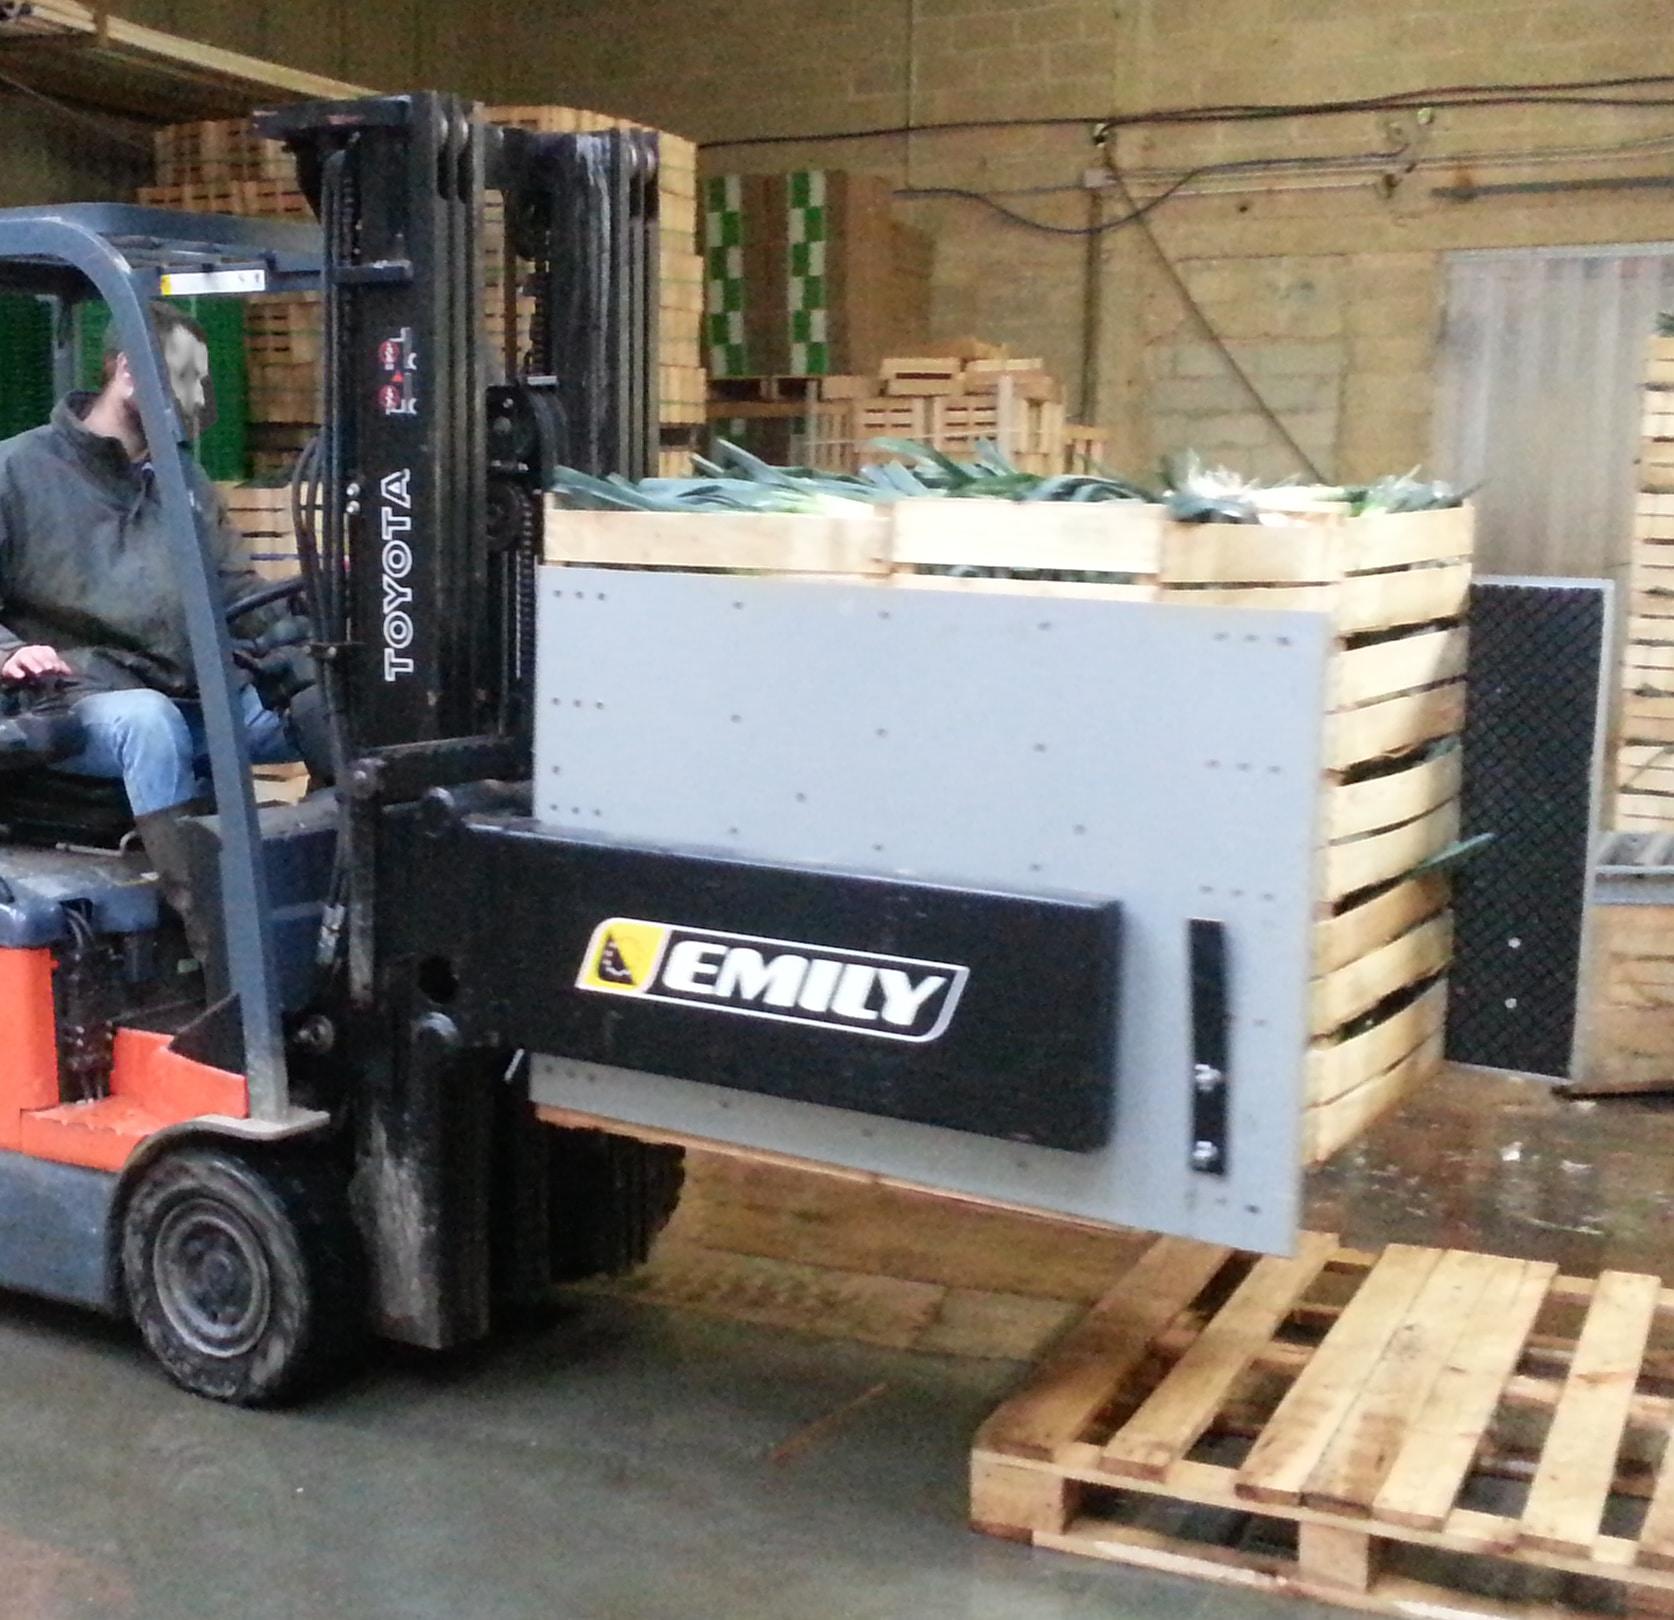 Forklift multi-purpose clamp